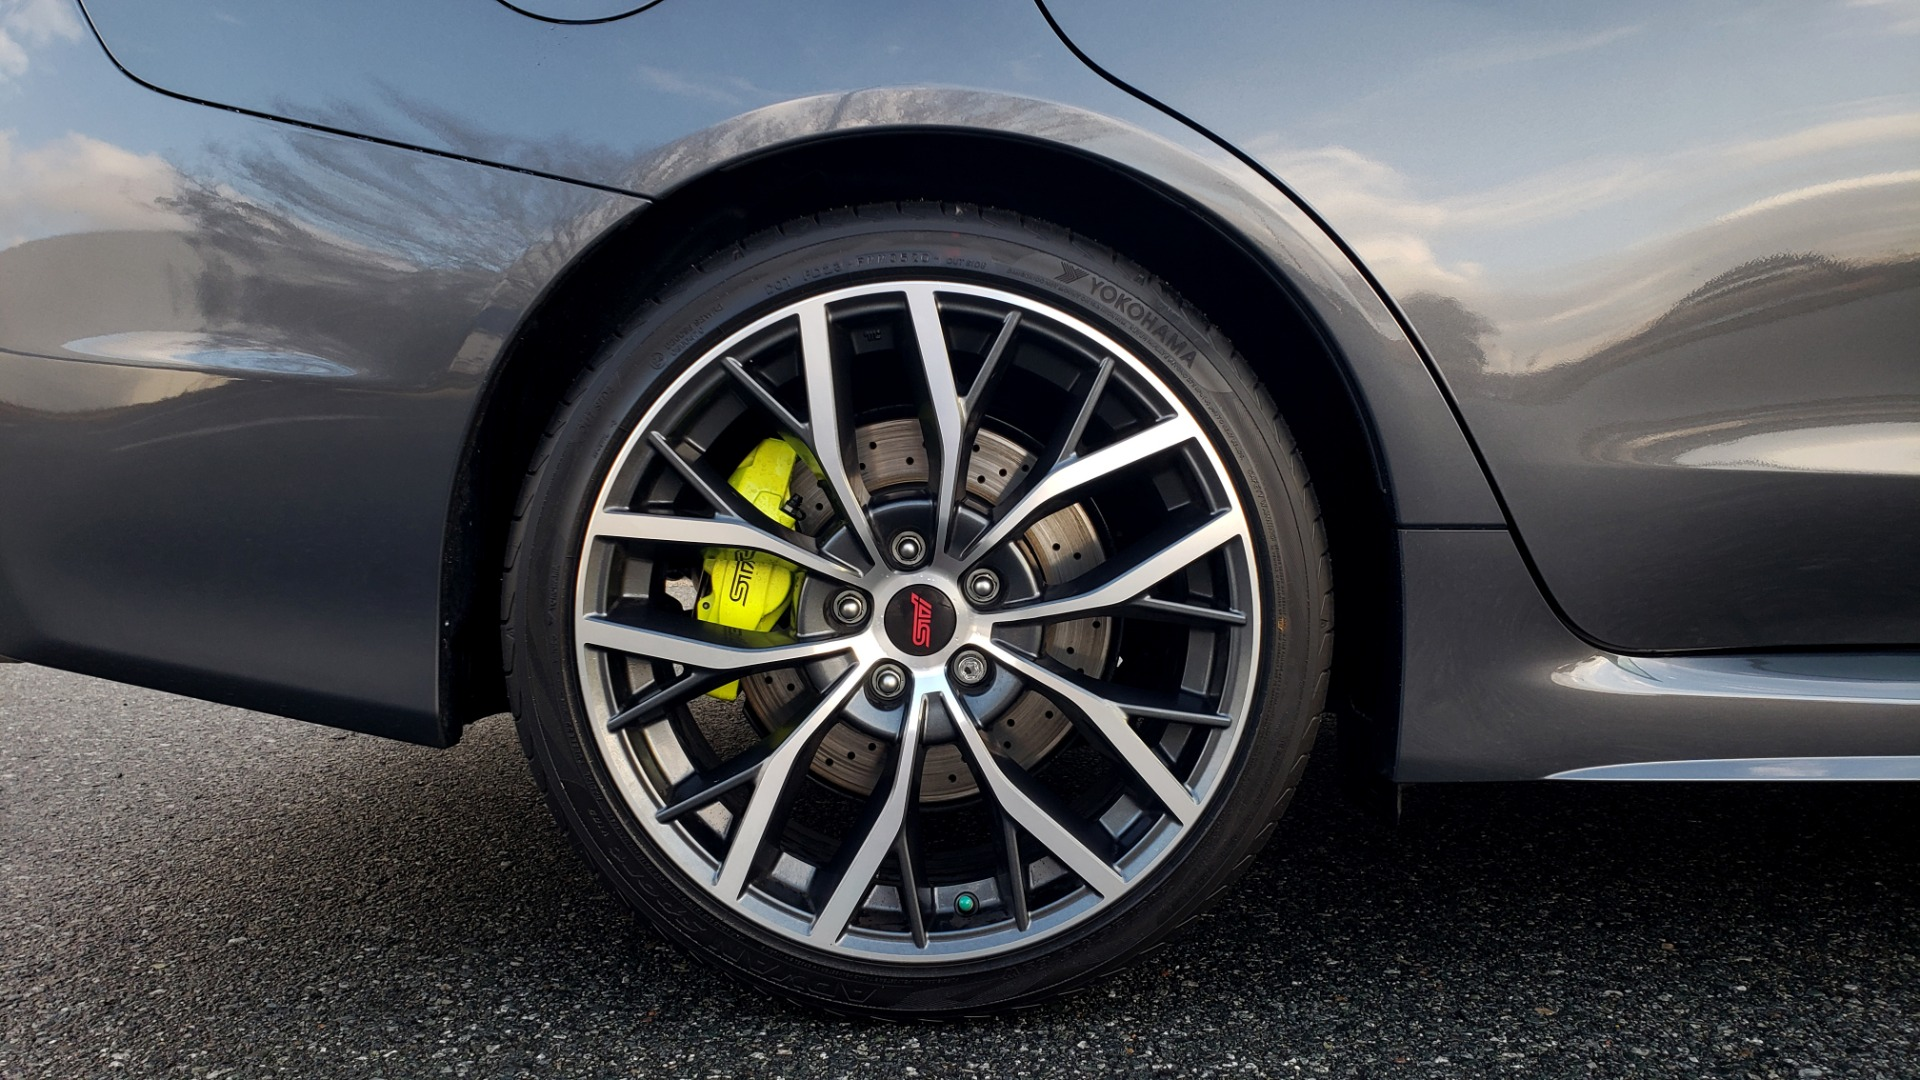 Used 2020 Subaru WRX STI 2.5L TURBO / 6-SPEED MANUAL / RECARO SEATS / REARVIEW for sale Sold at Formula Imports in Charlotte NC 28227 92